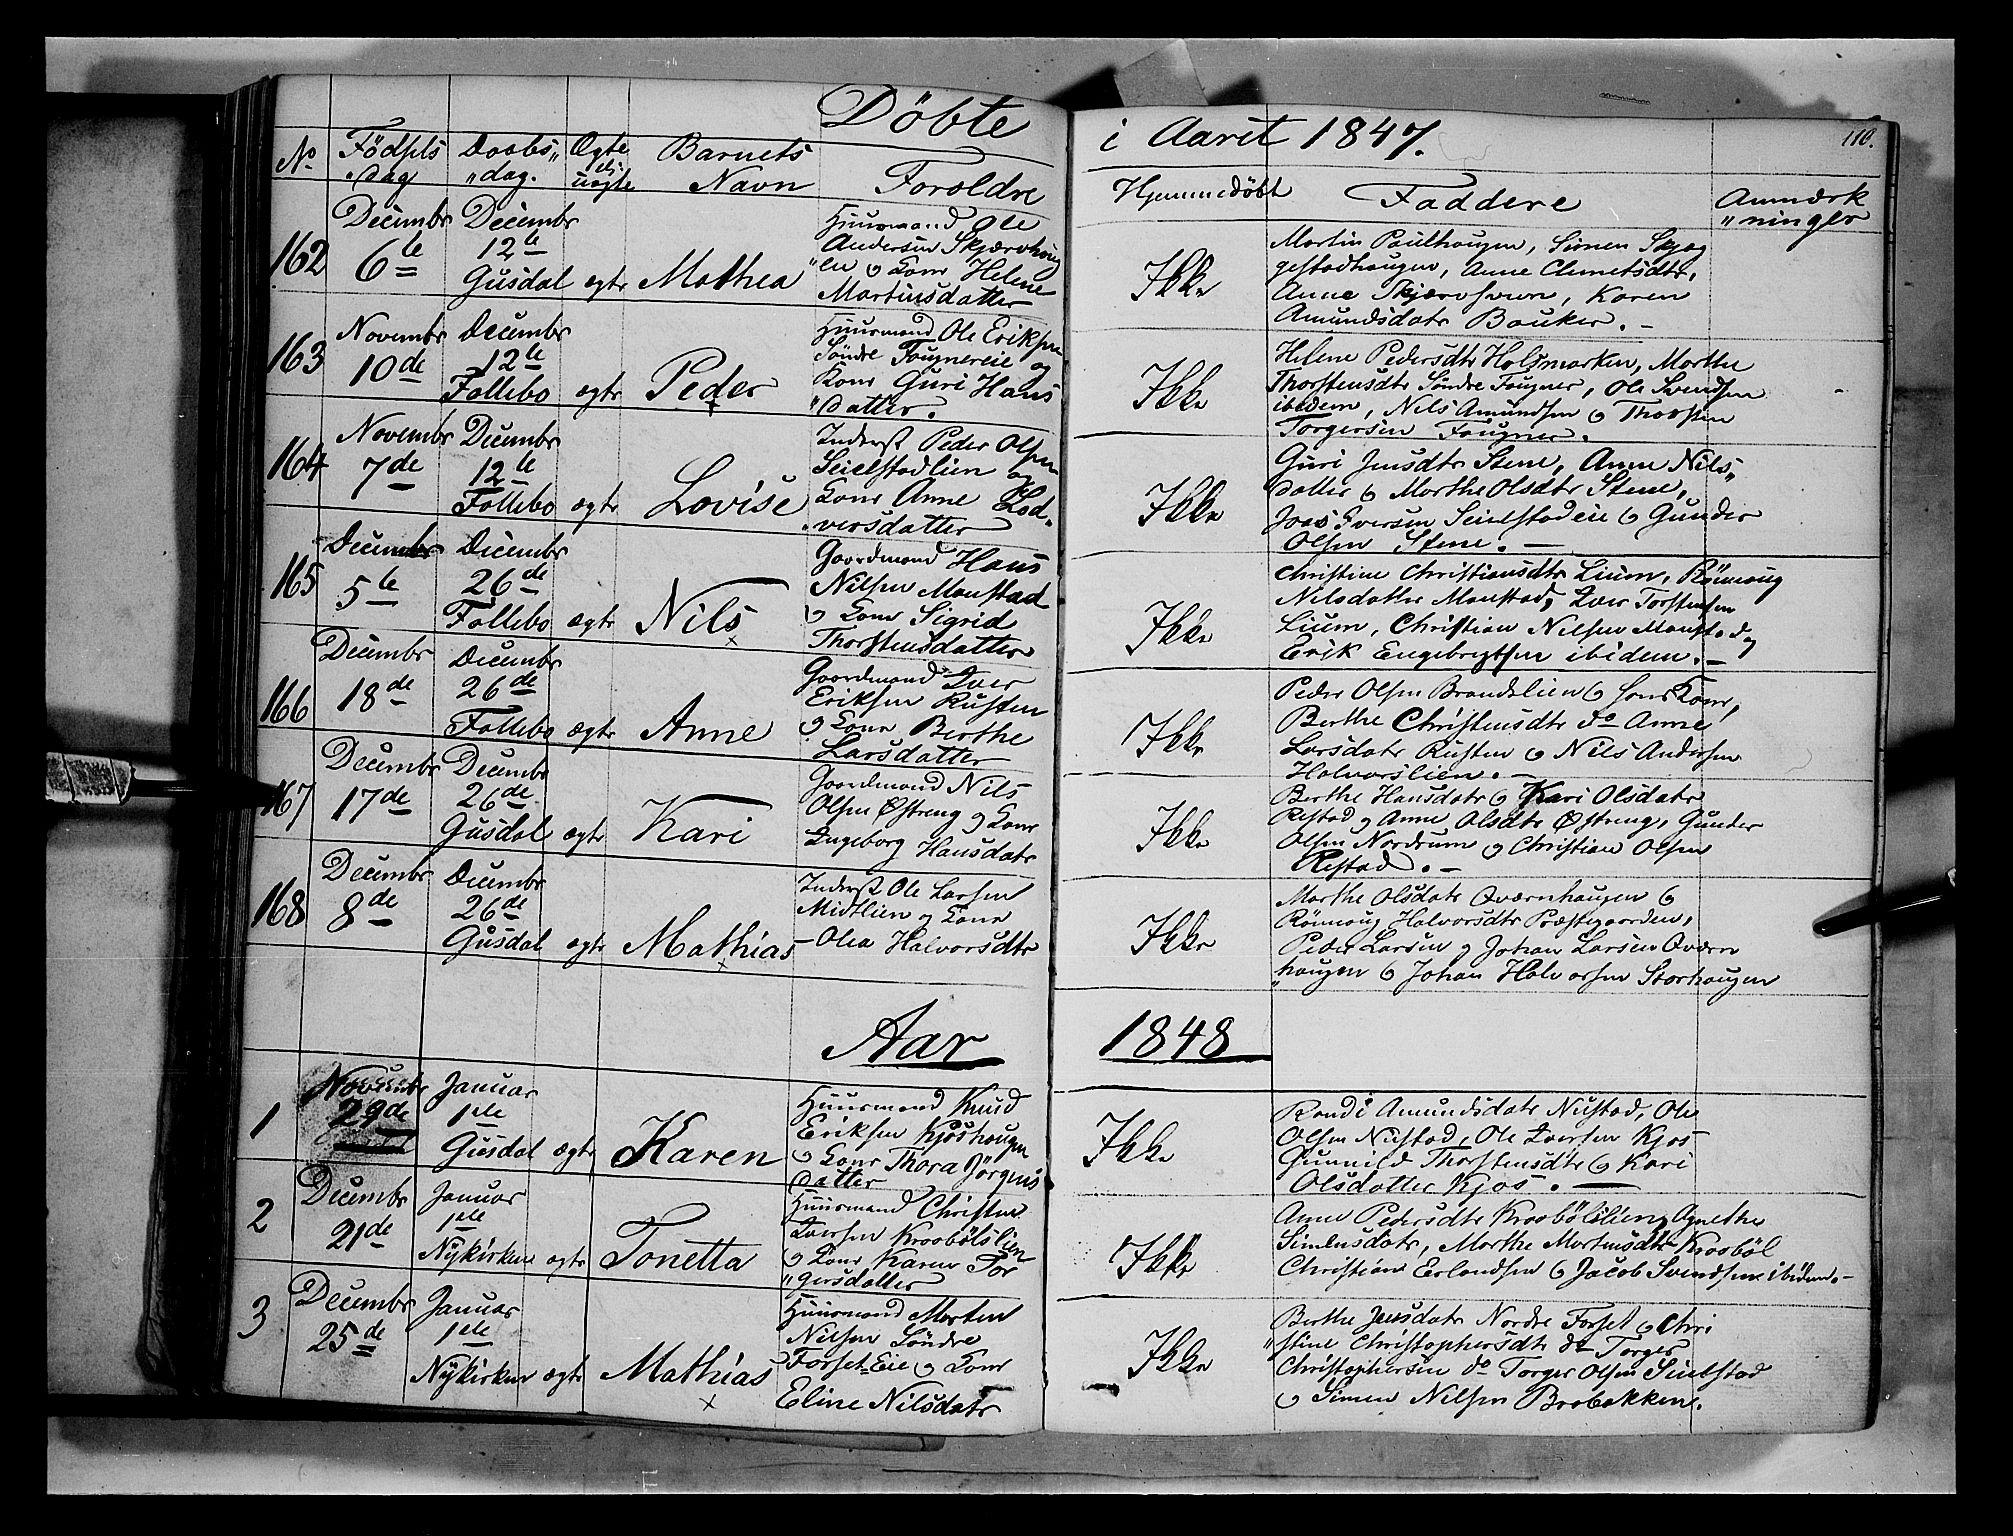 SAH, Gausdal prestekontor, Ministerialbok nr. 7, 1840-1850, s. 110